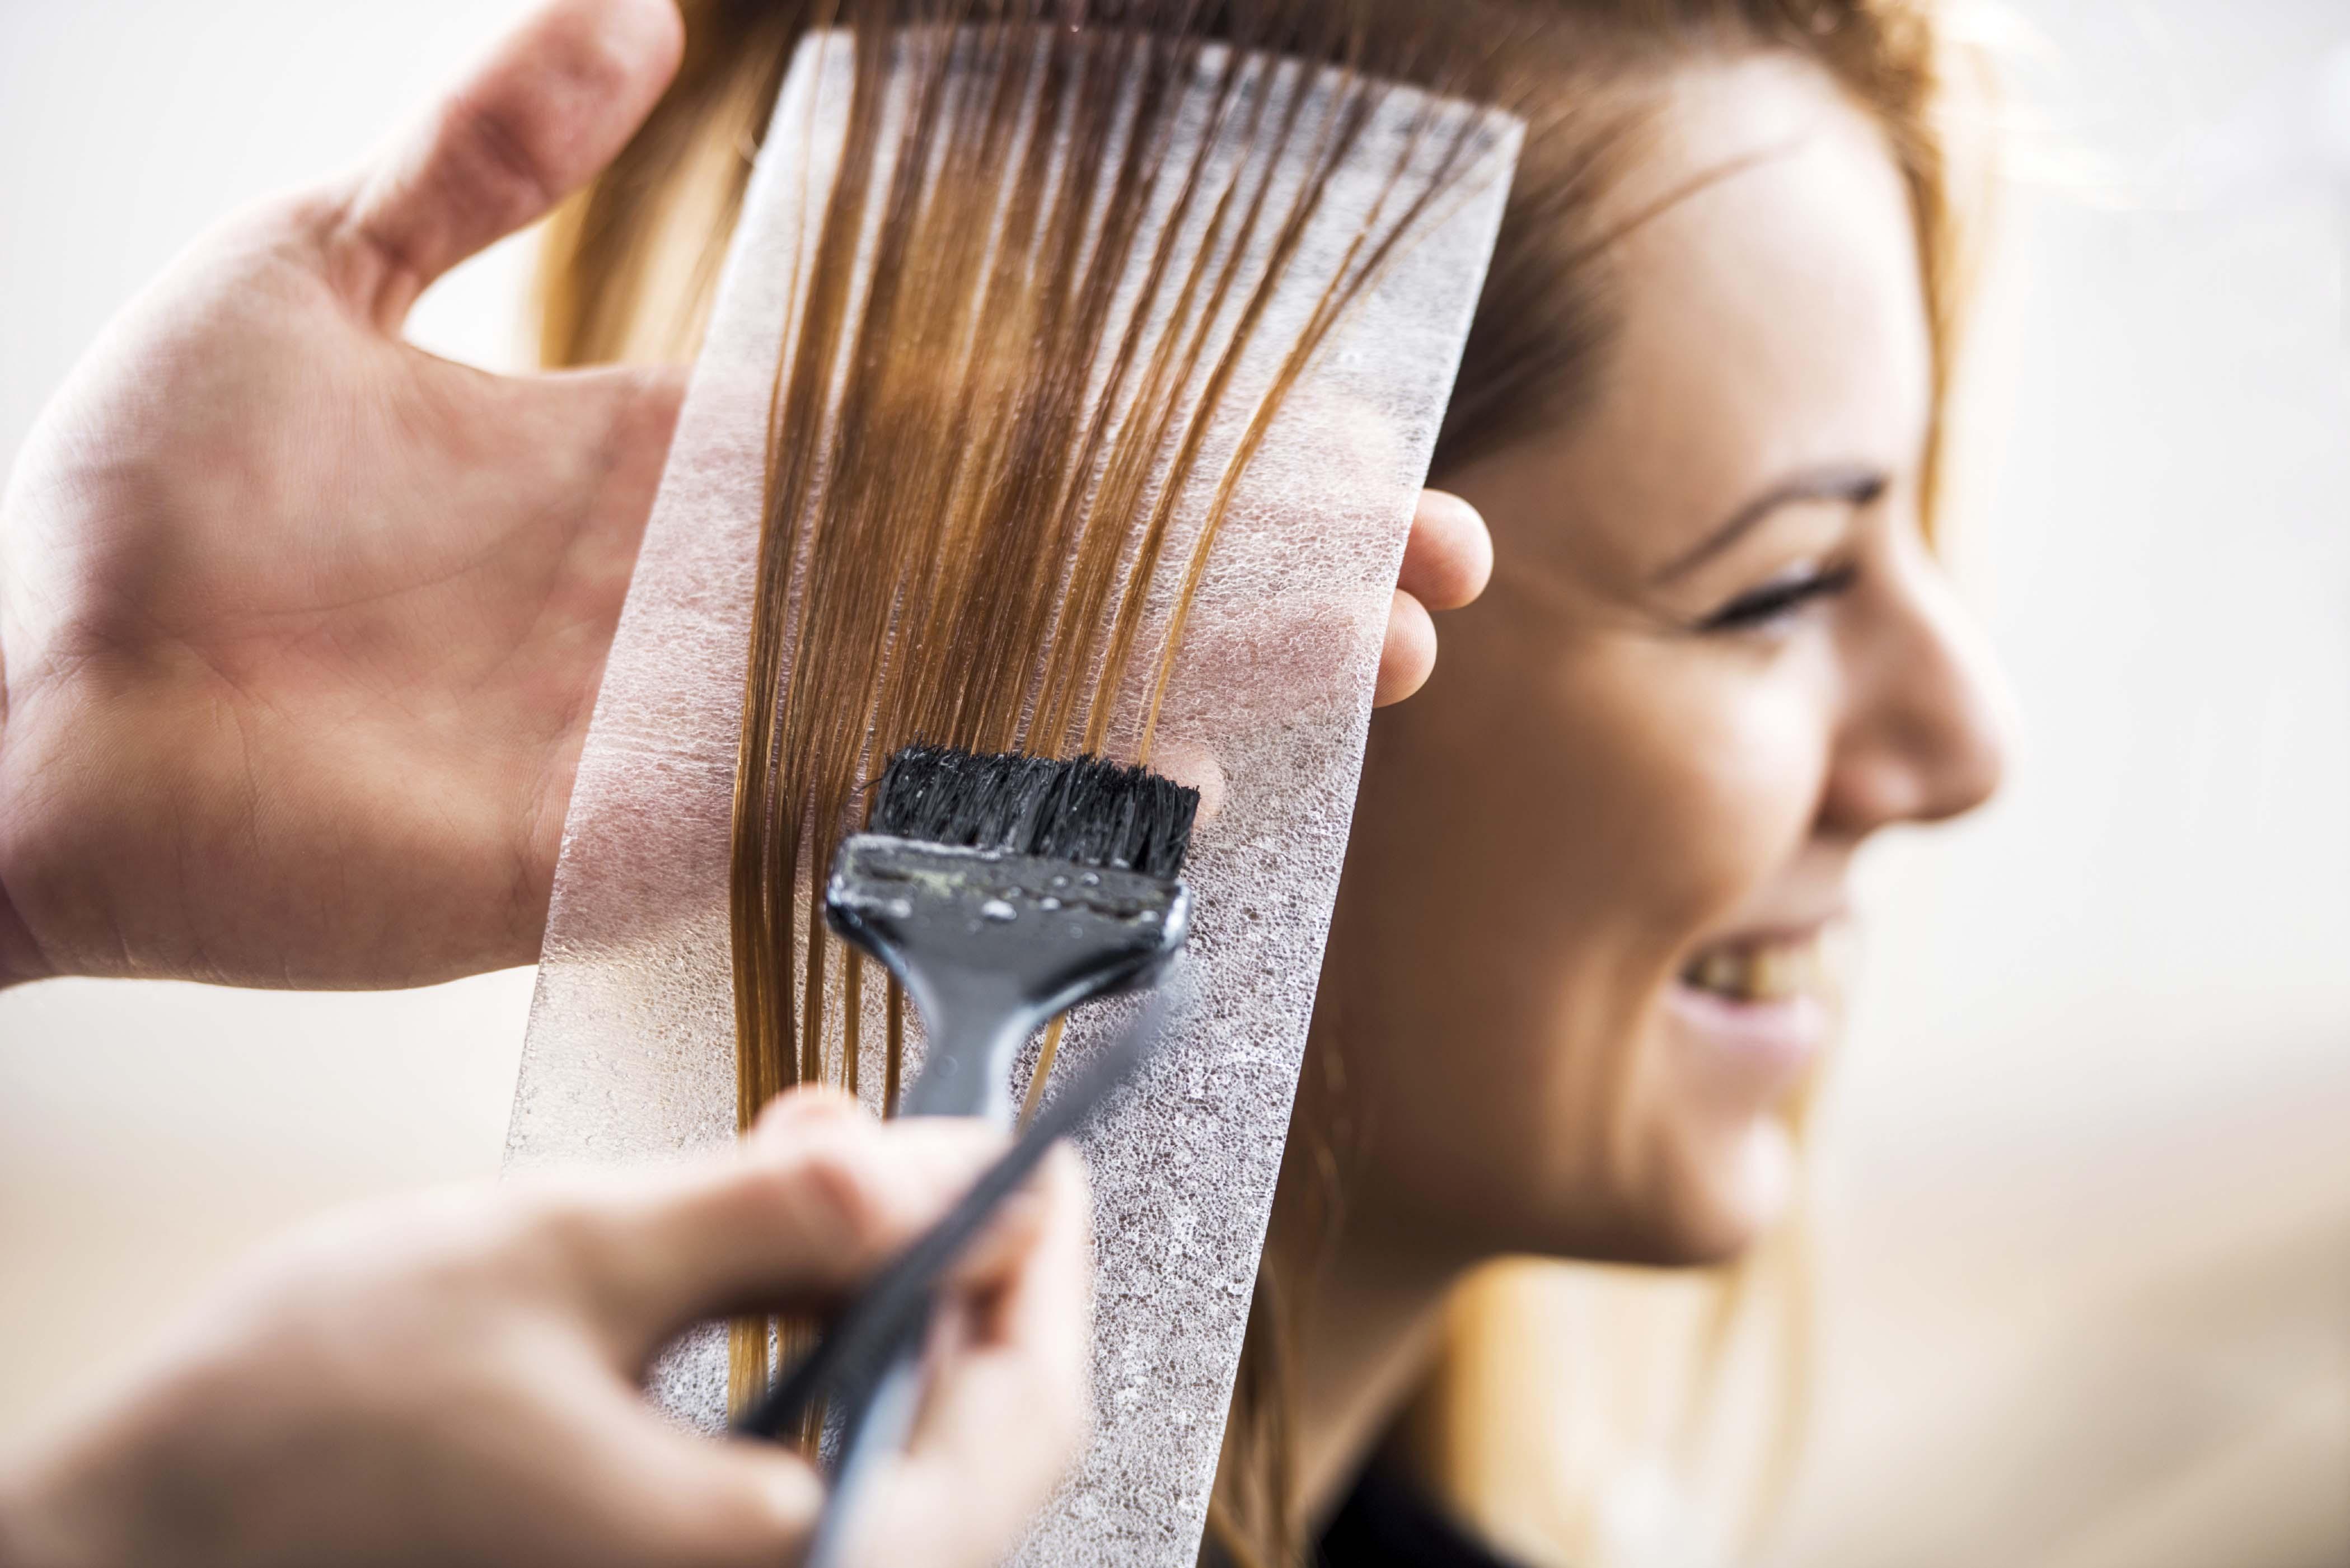 hair dye can result in dry hair